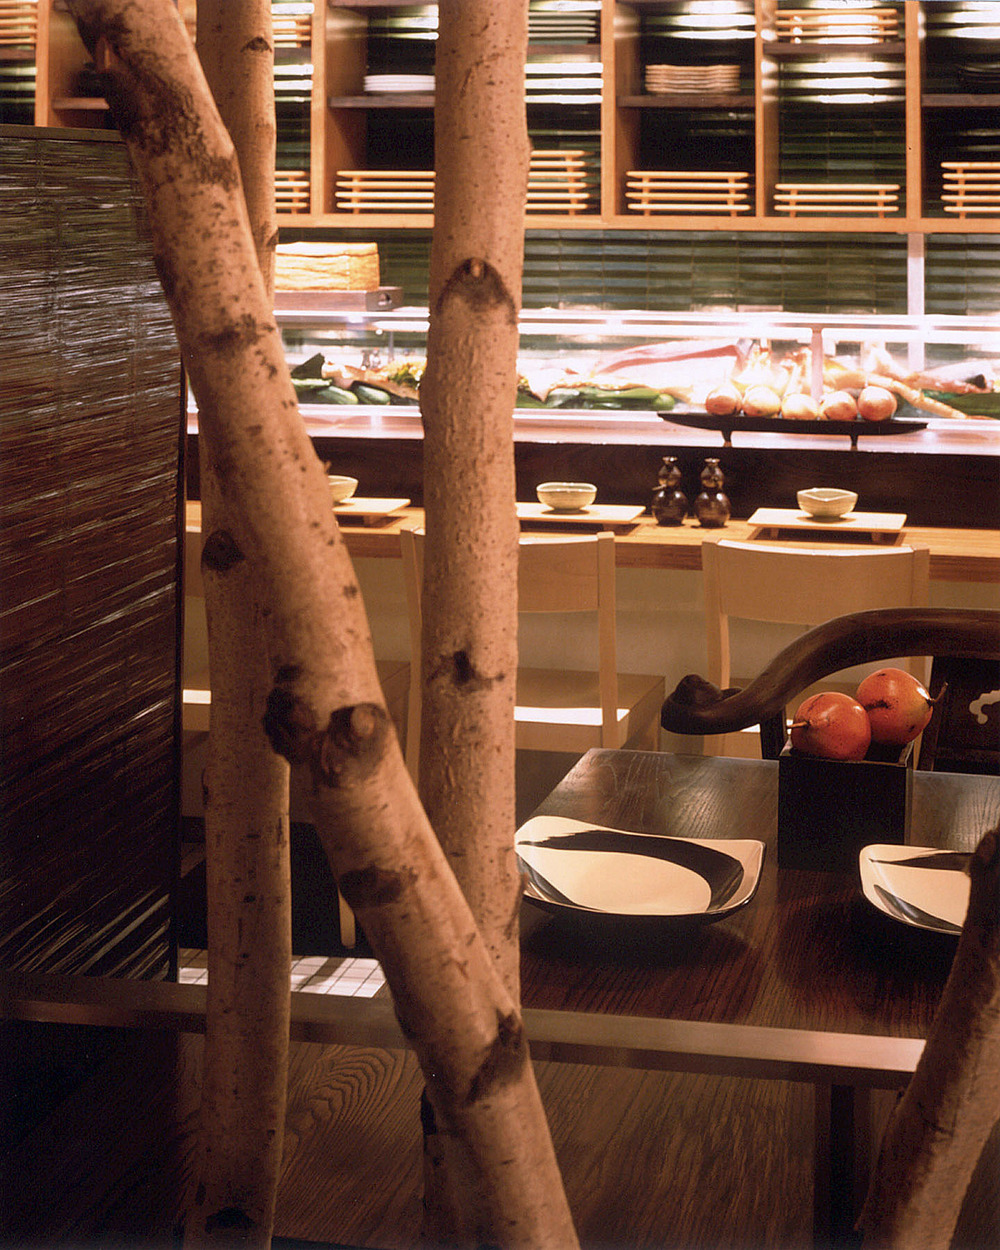 Haru Restaurant. Tobin Parnes Design. Hospitality Design. Times Square. NYC. Sushi Bar.